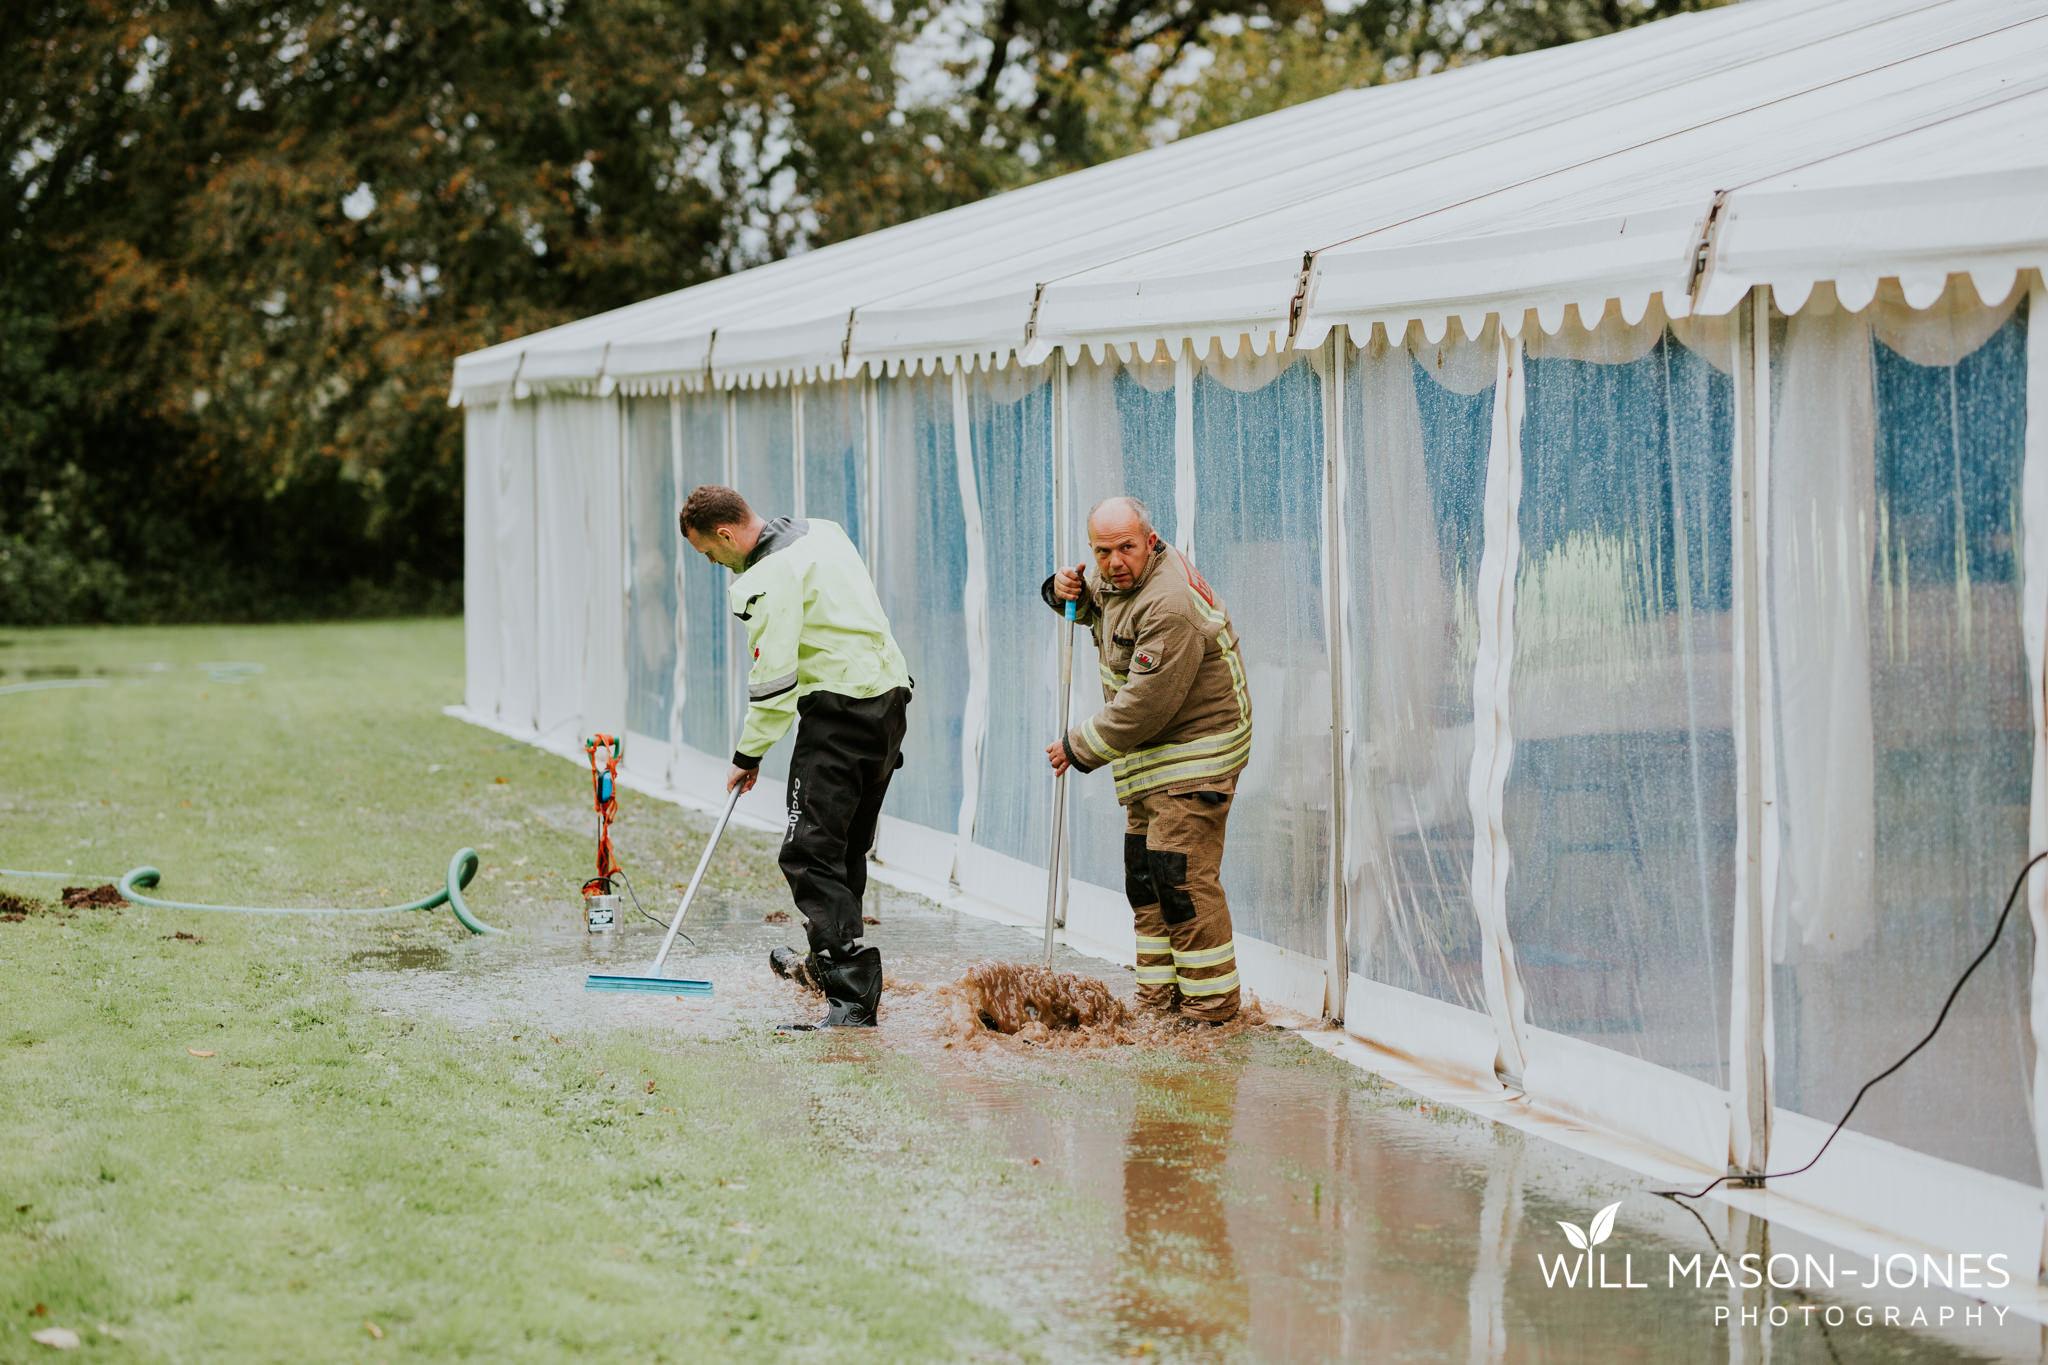 plas-glansevin-wet-rainy-bridal-wedding-preparations-swansea-photographers-3.jpg